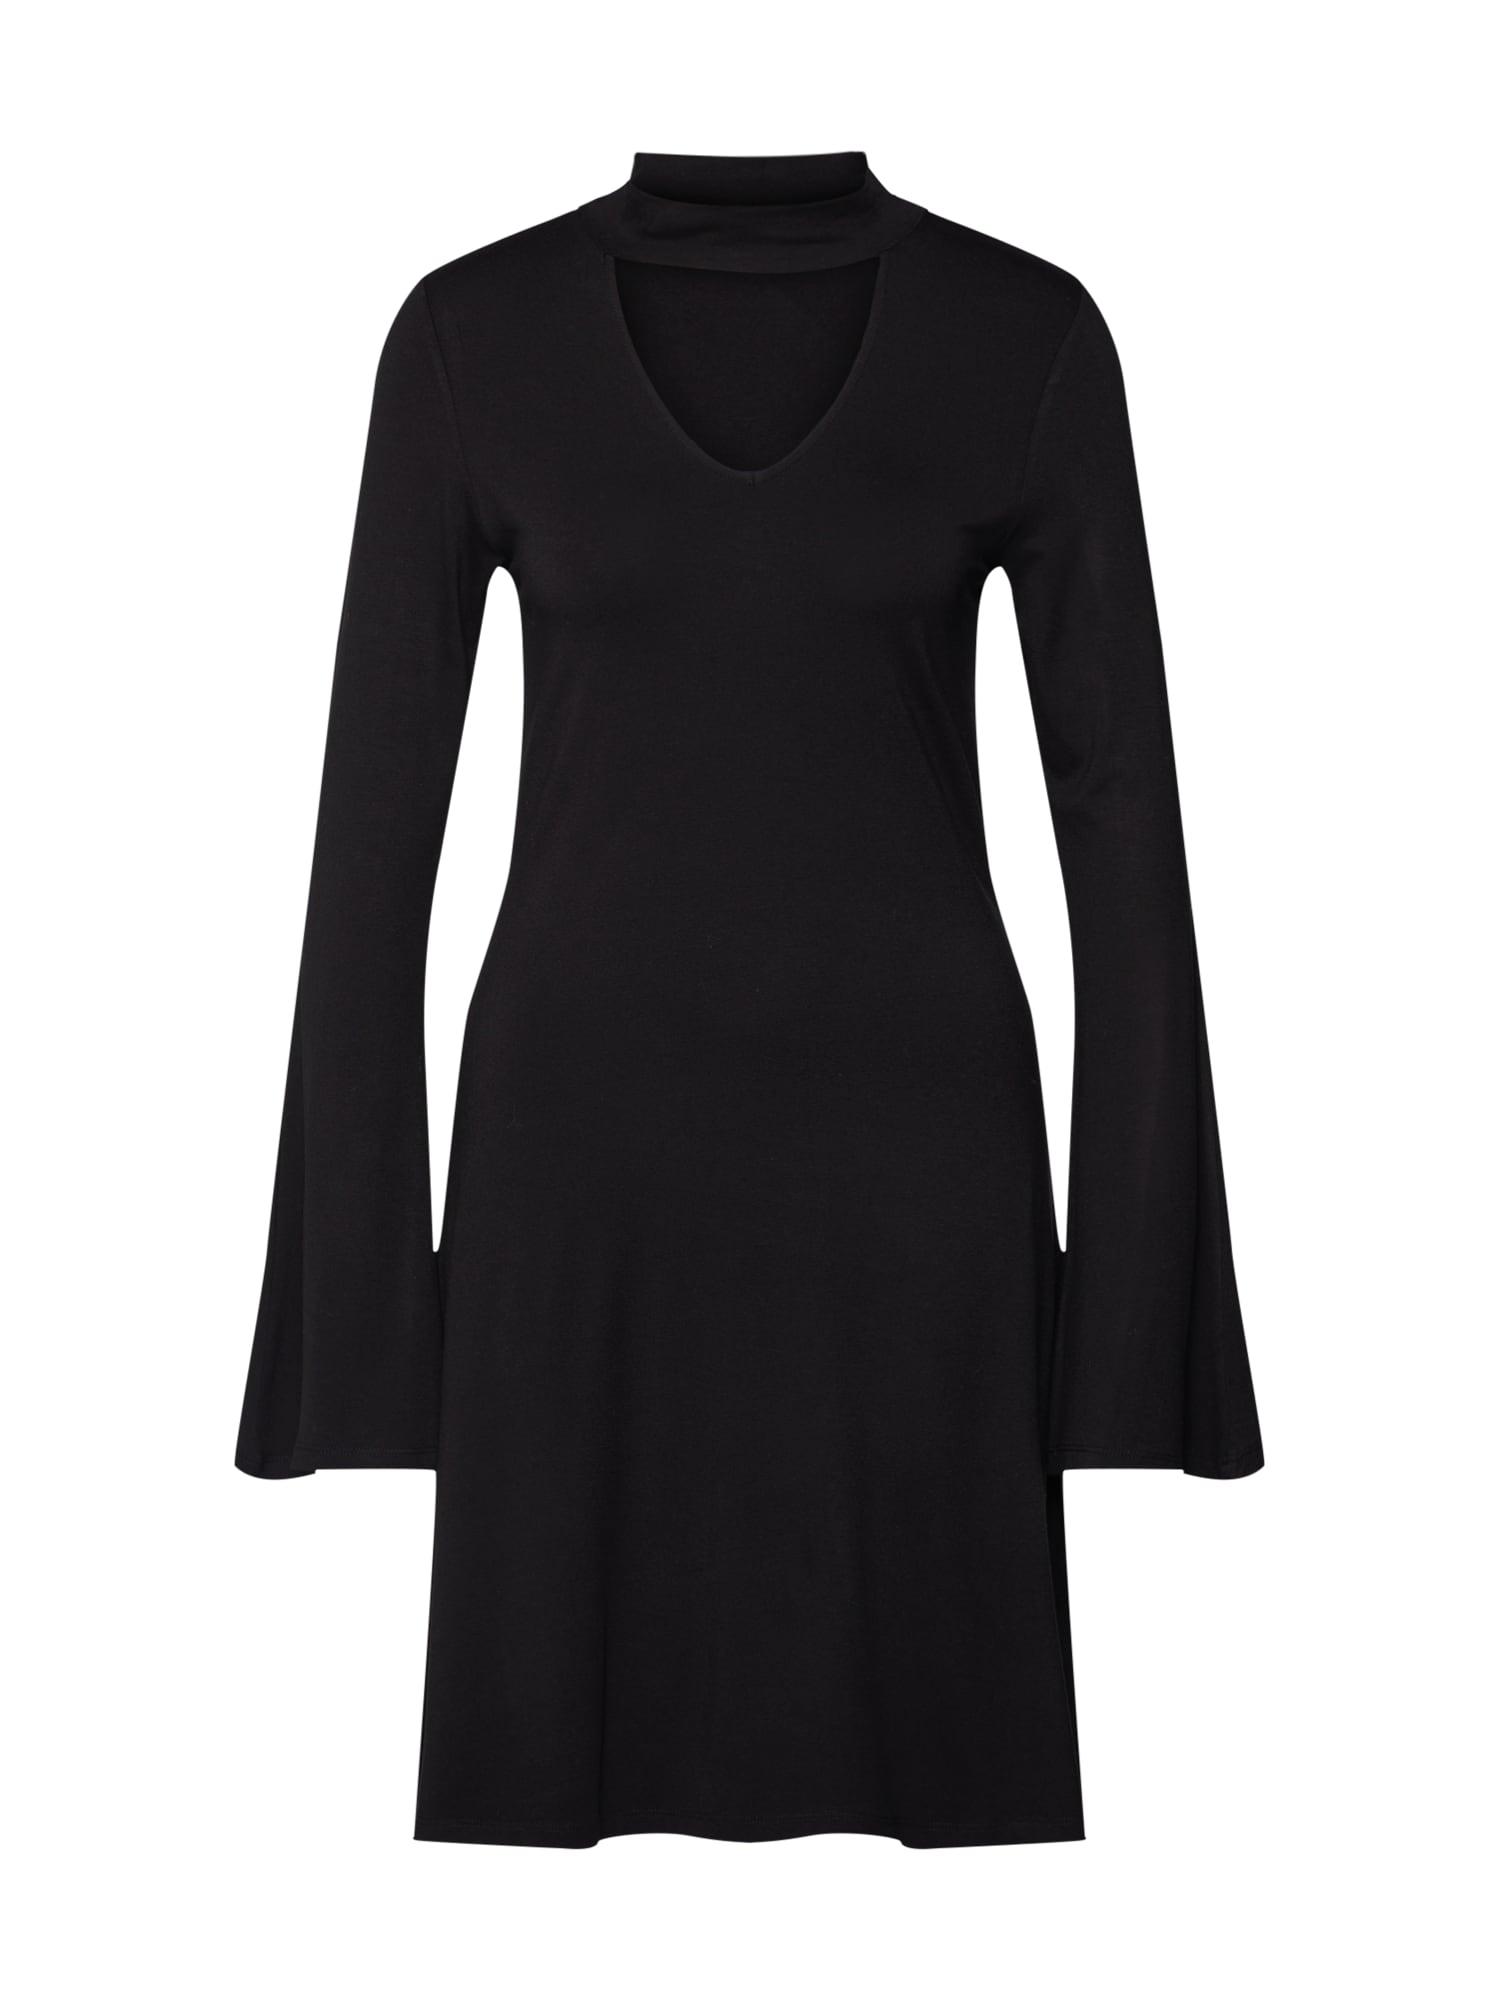 Šaty NuF_074 černá NADEL U FADEN